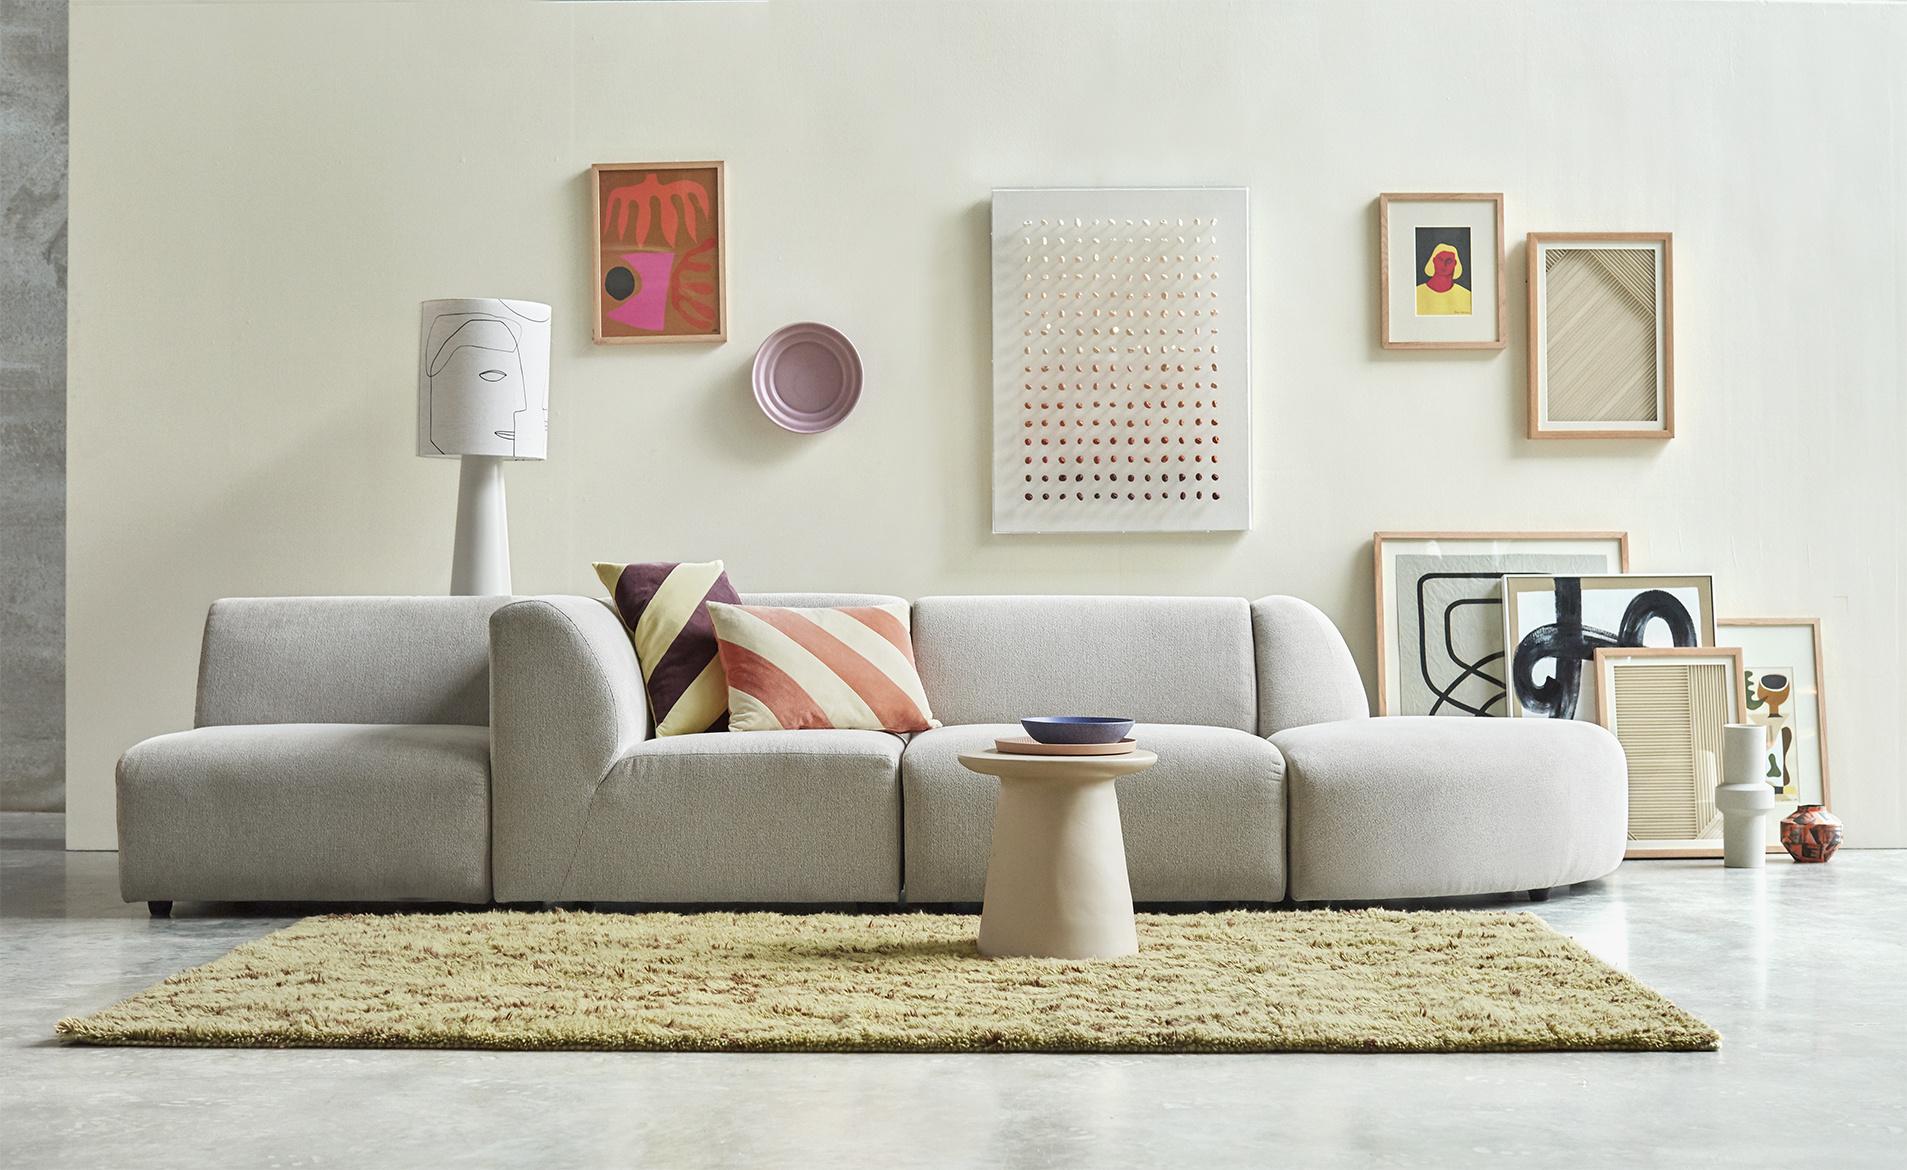 Wandschilderij layered paper art frame B-2